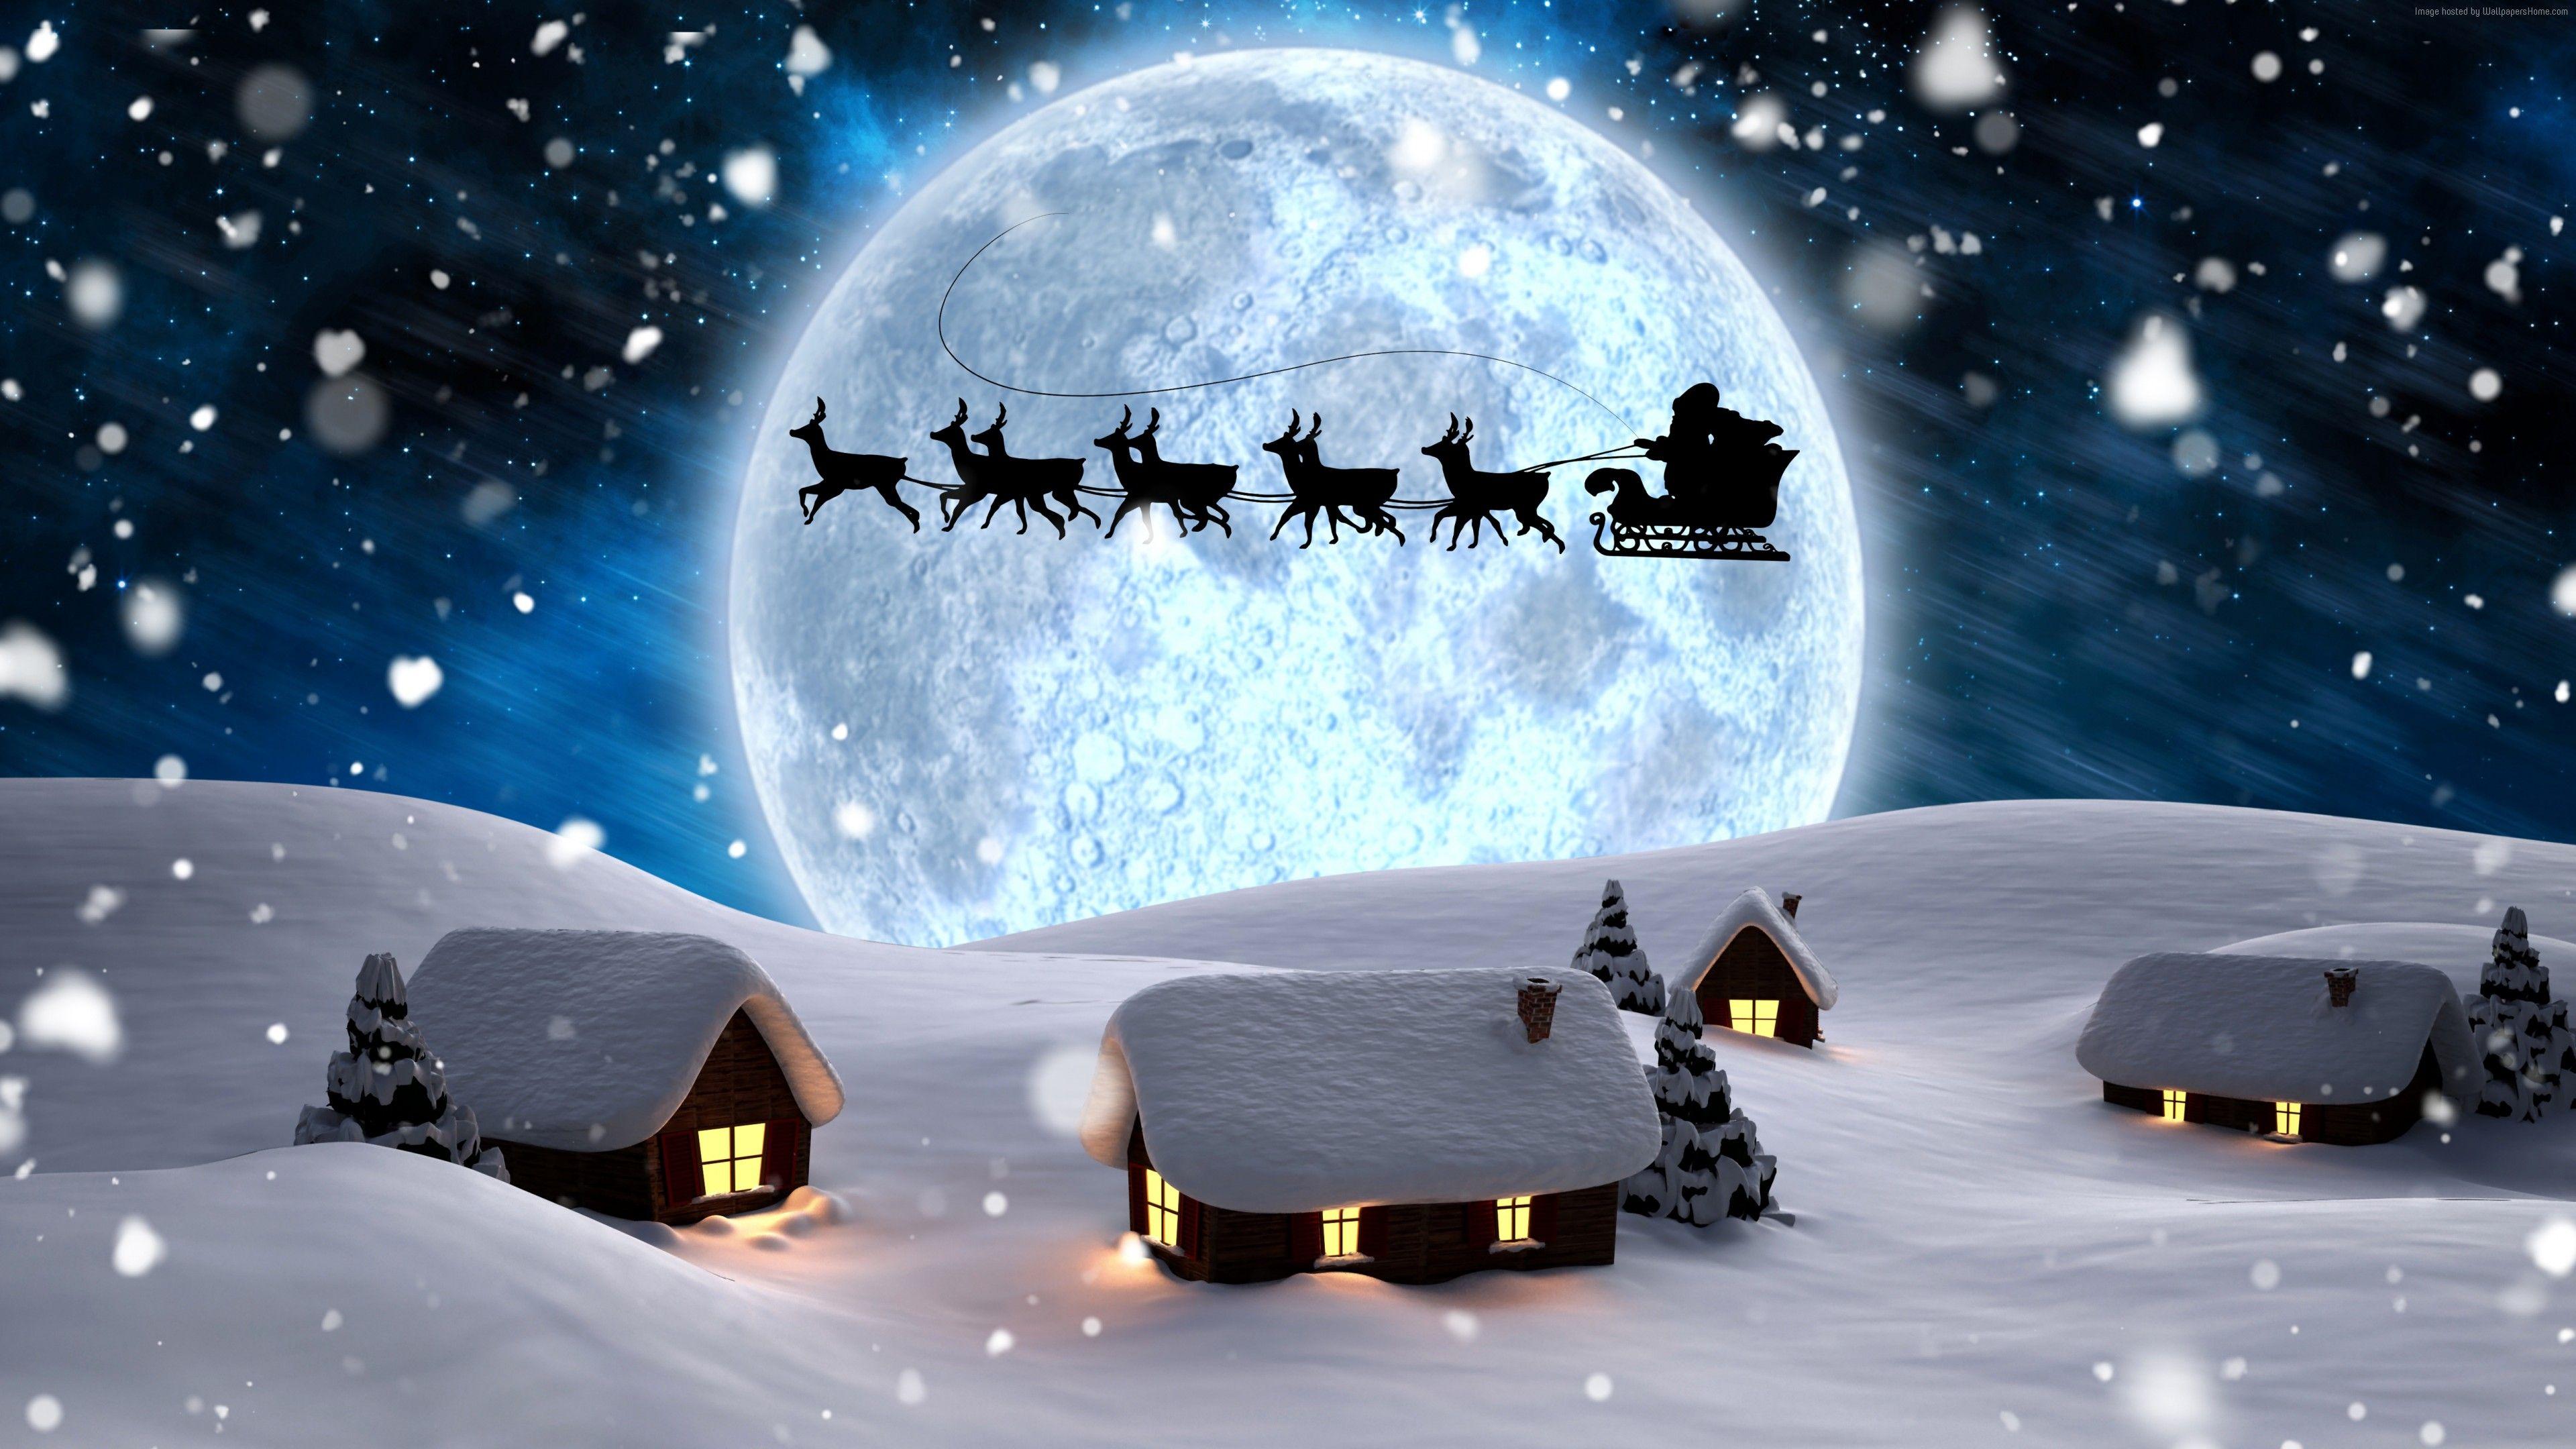 Wallpaper Christmas New Year Santa Deer Moon Night Winter